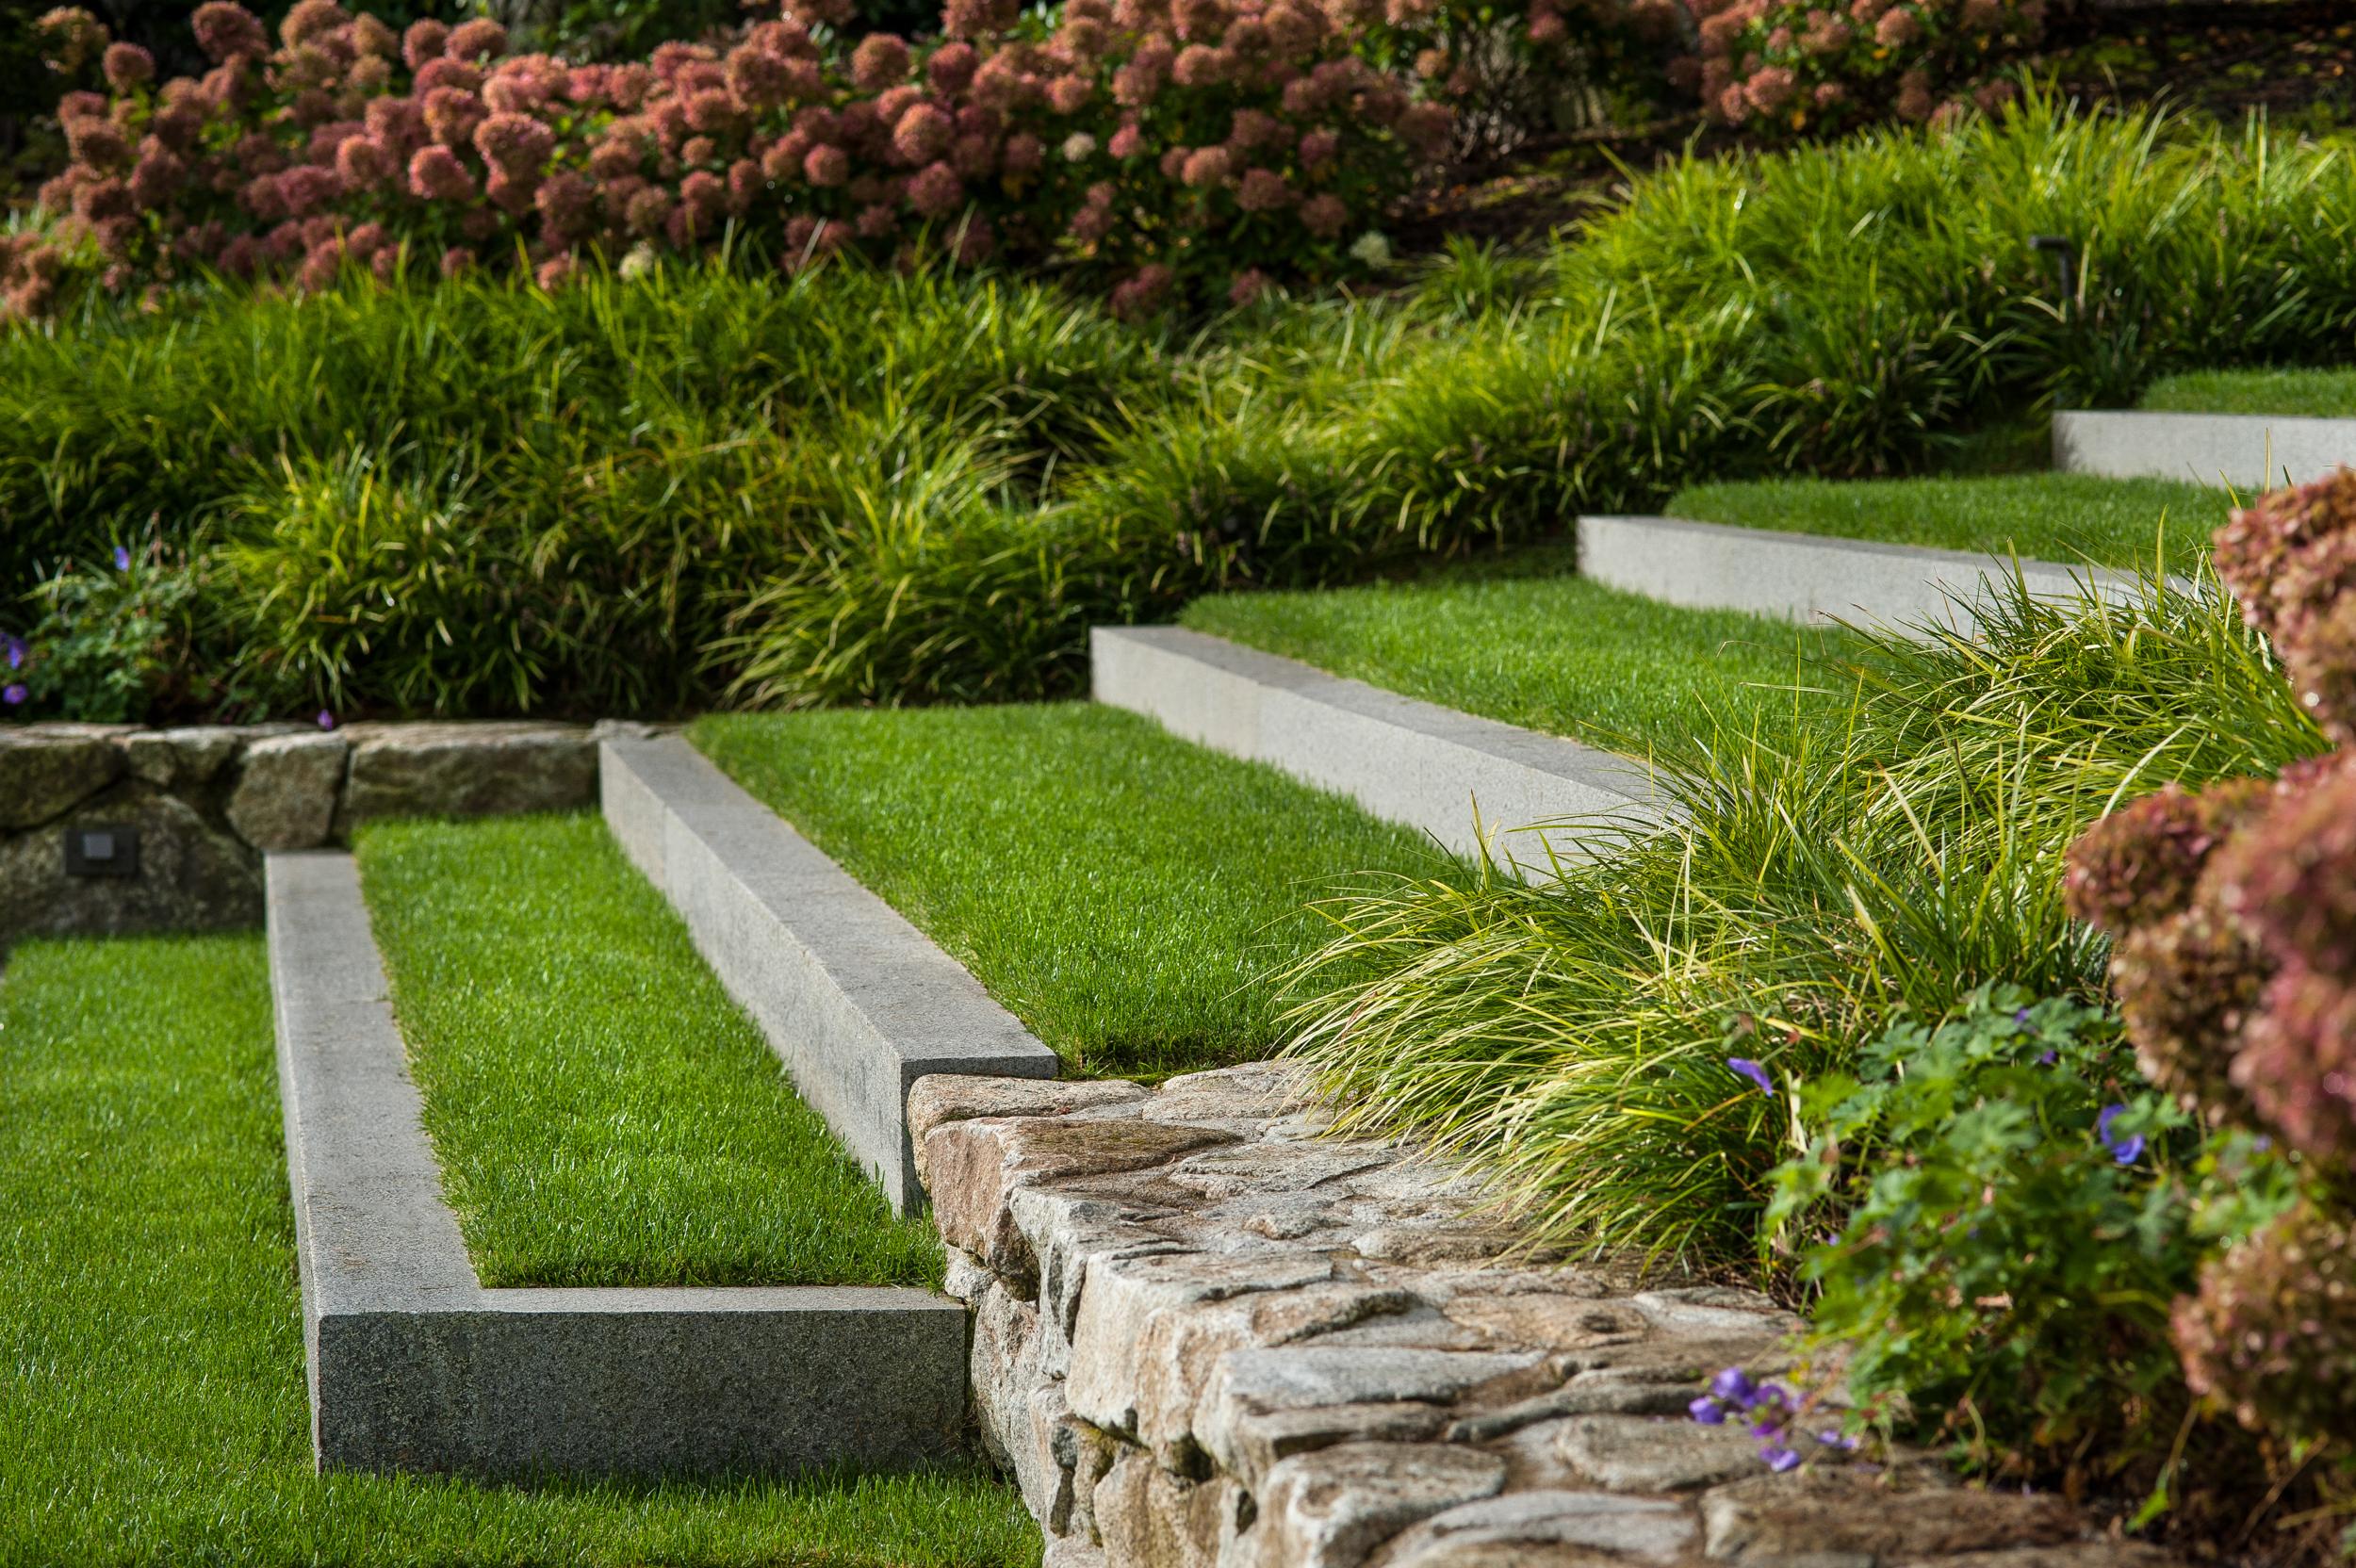 Granite and grass steps with hydrangea paniculata